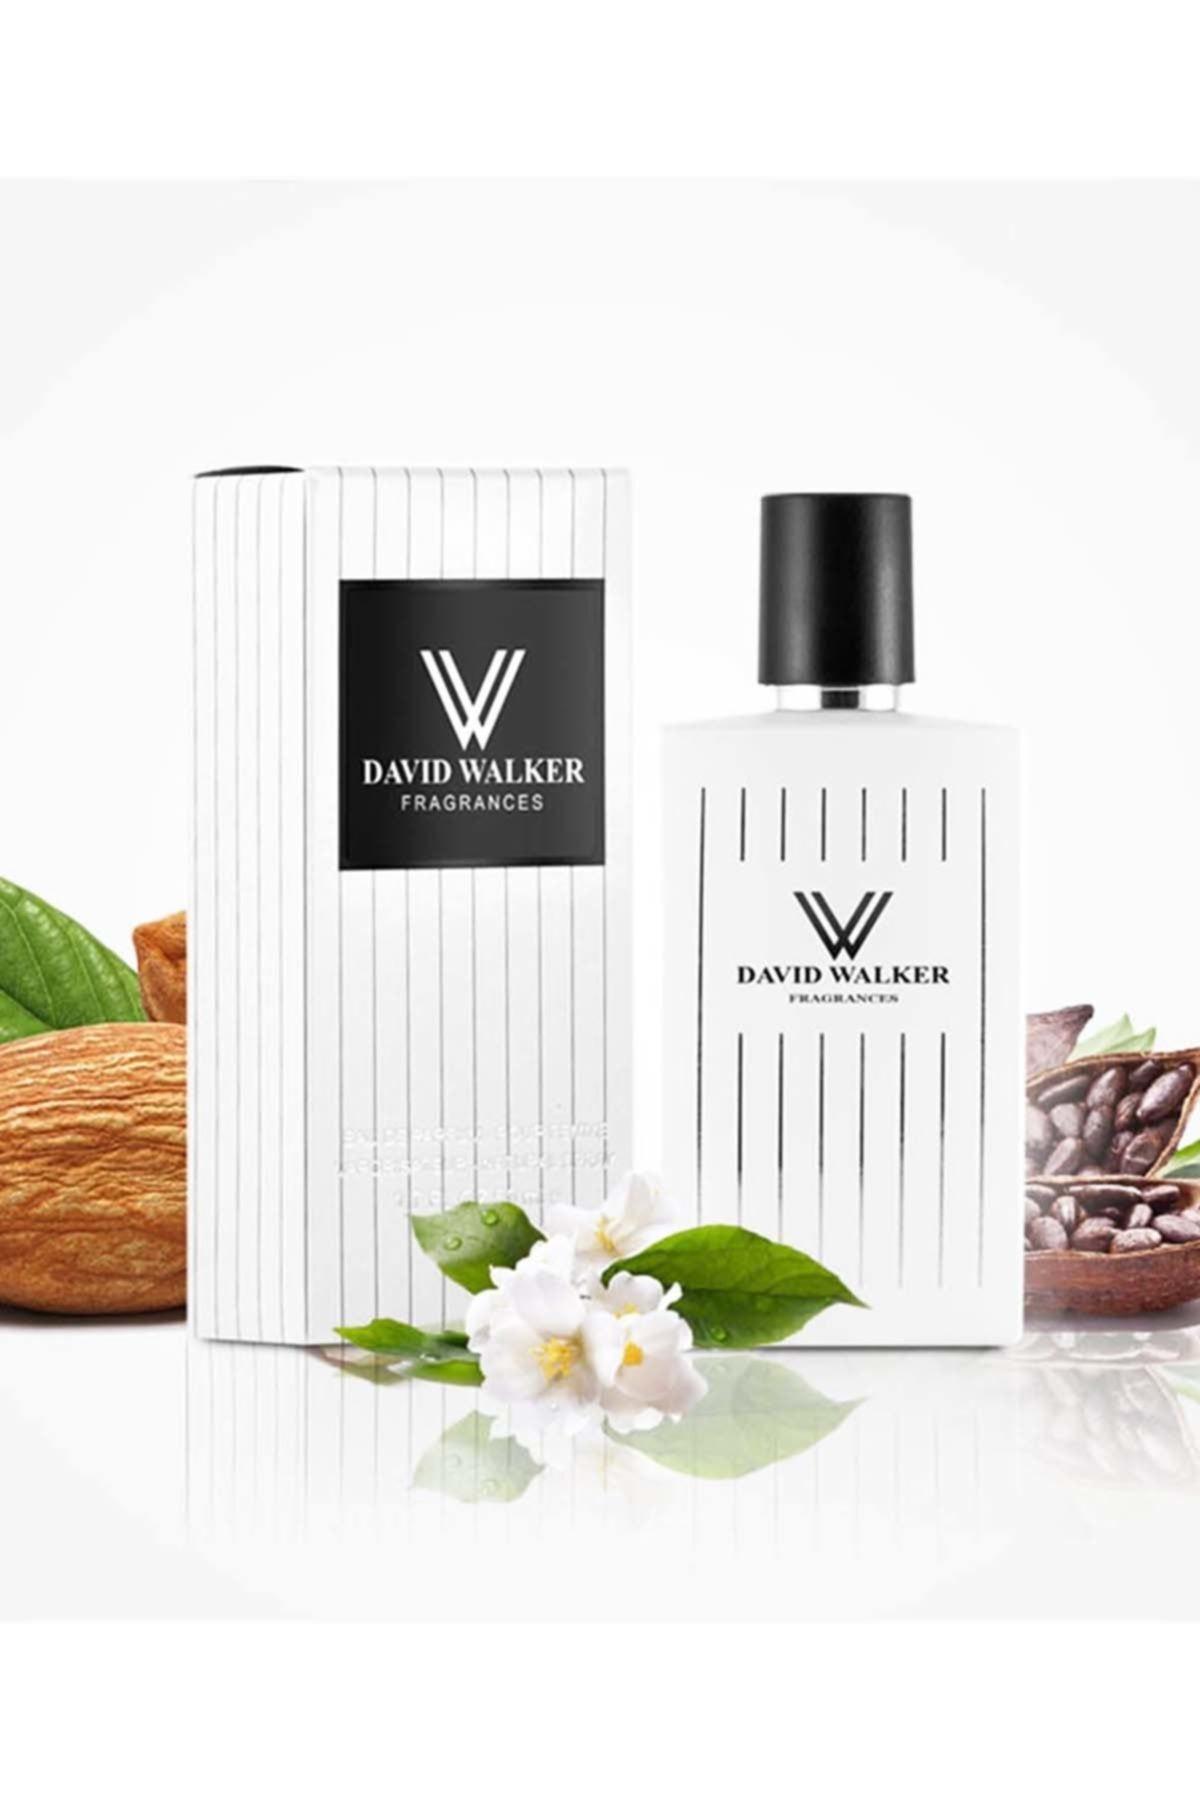 David Walker Wıld Flower B206 50 ml Oryantal Kadın Parfüm 1